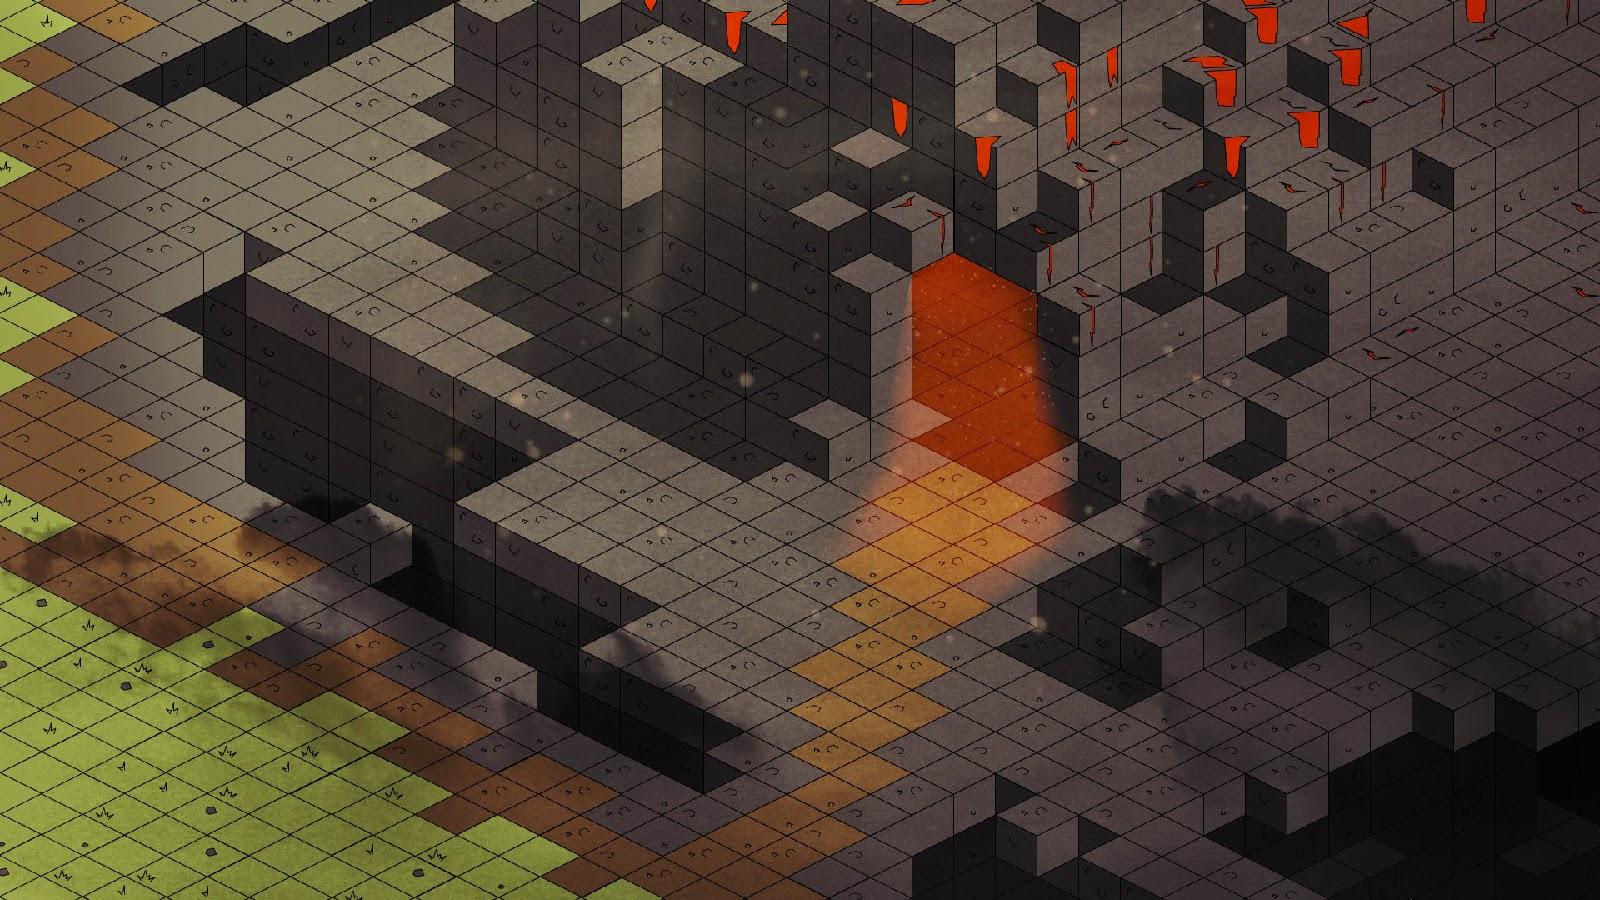 Brick Landscape - Guild Wars 2: Mount Maelstrom